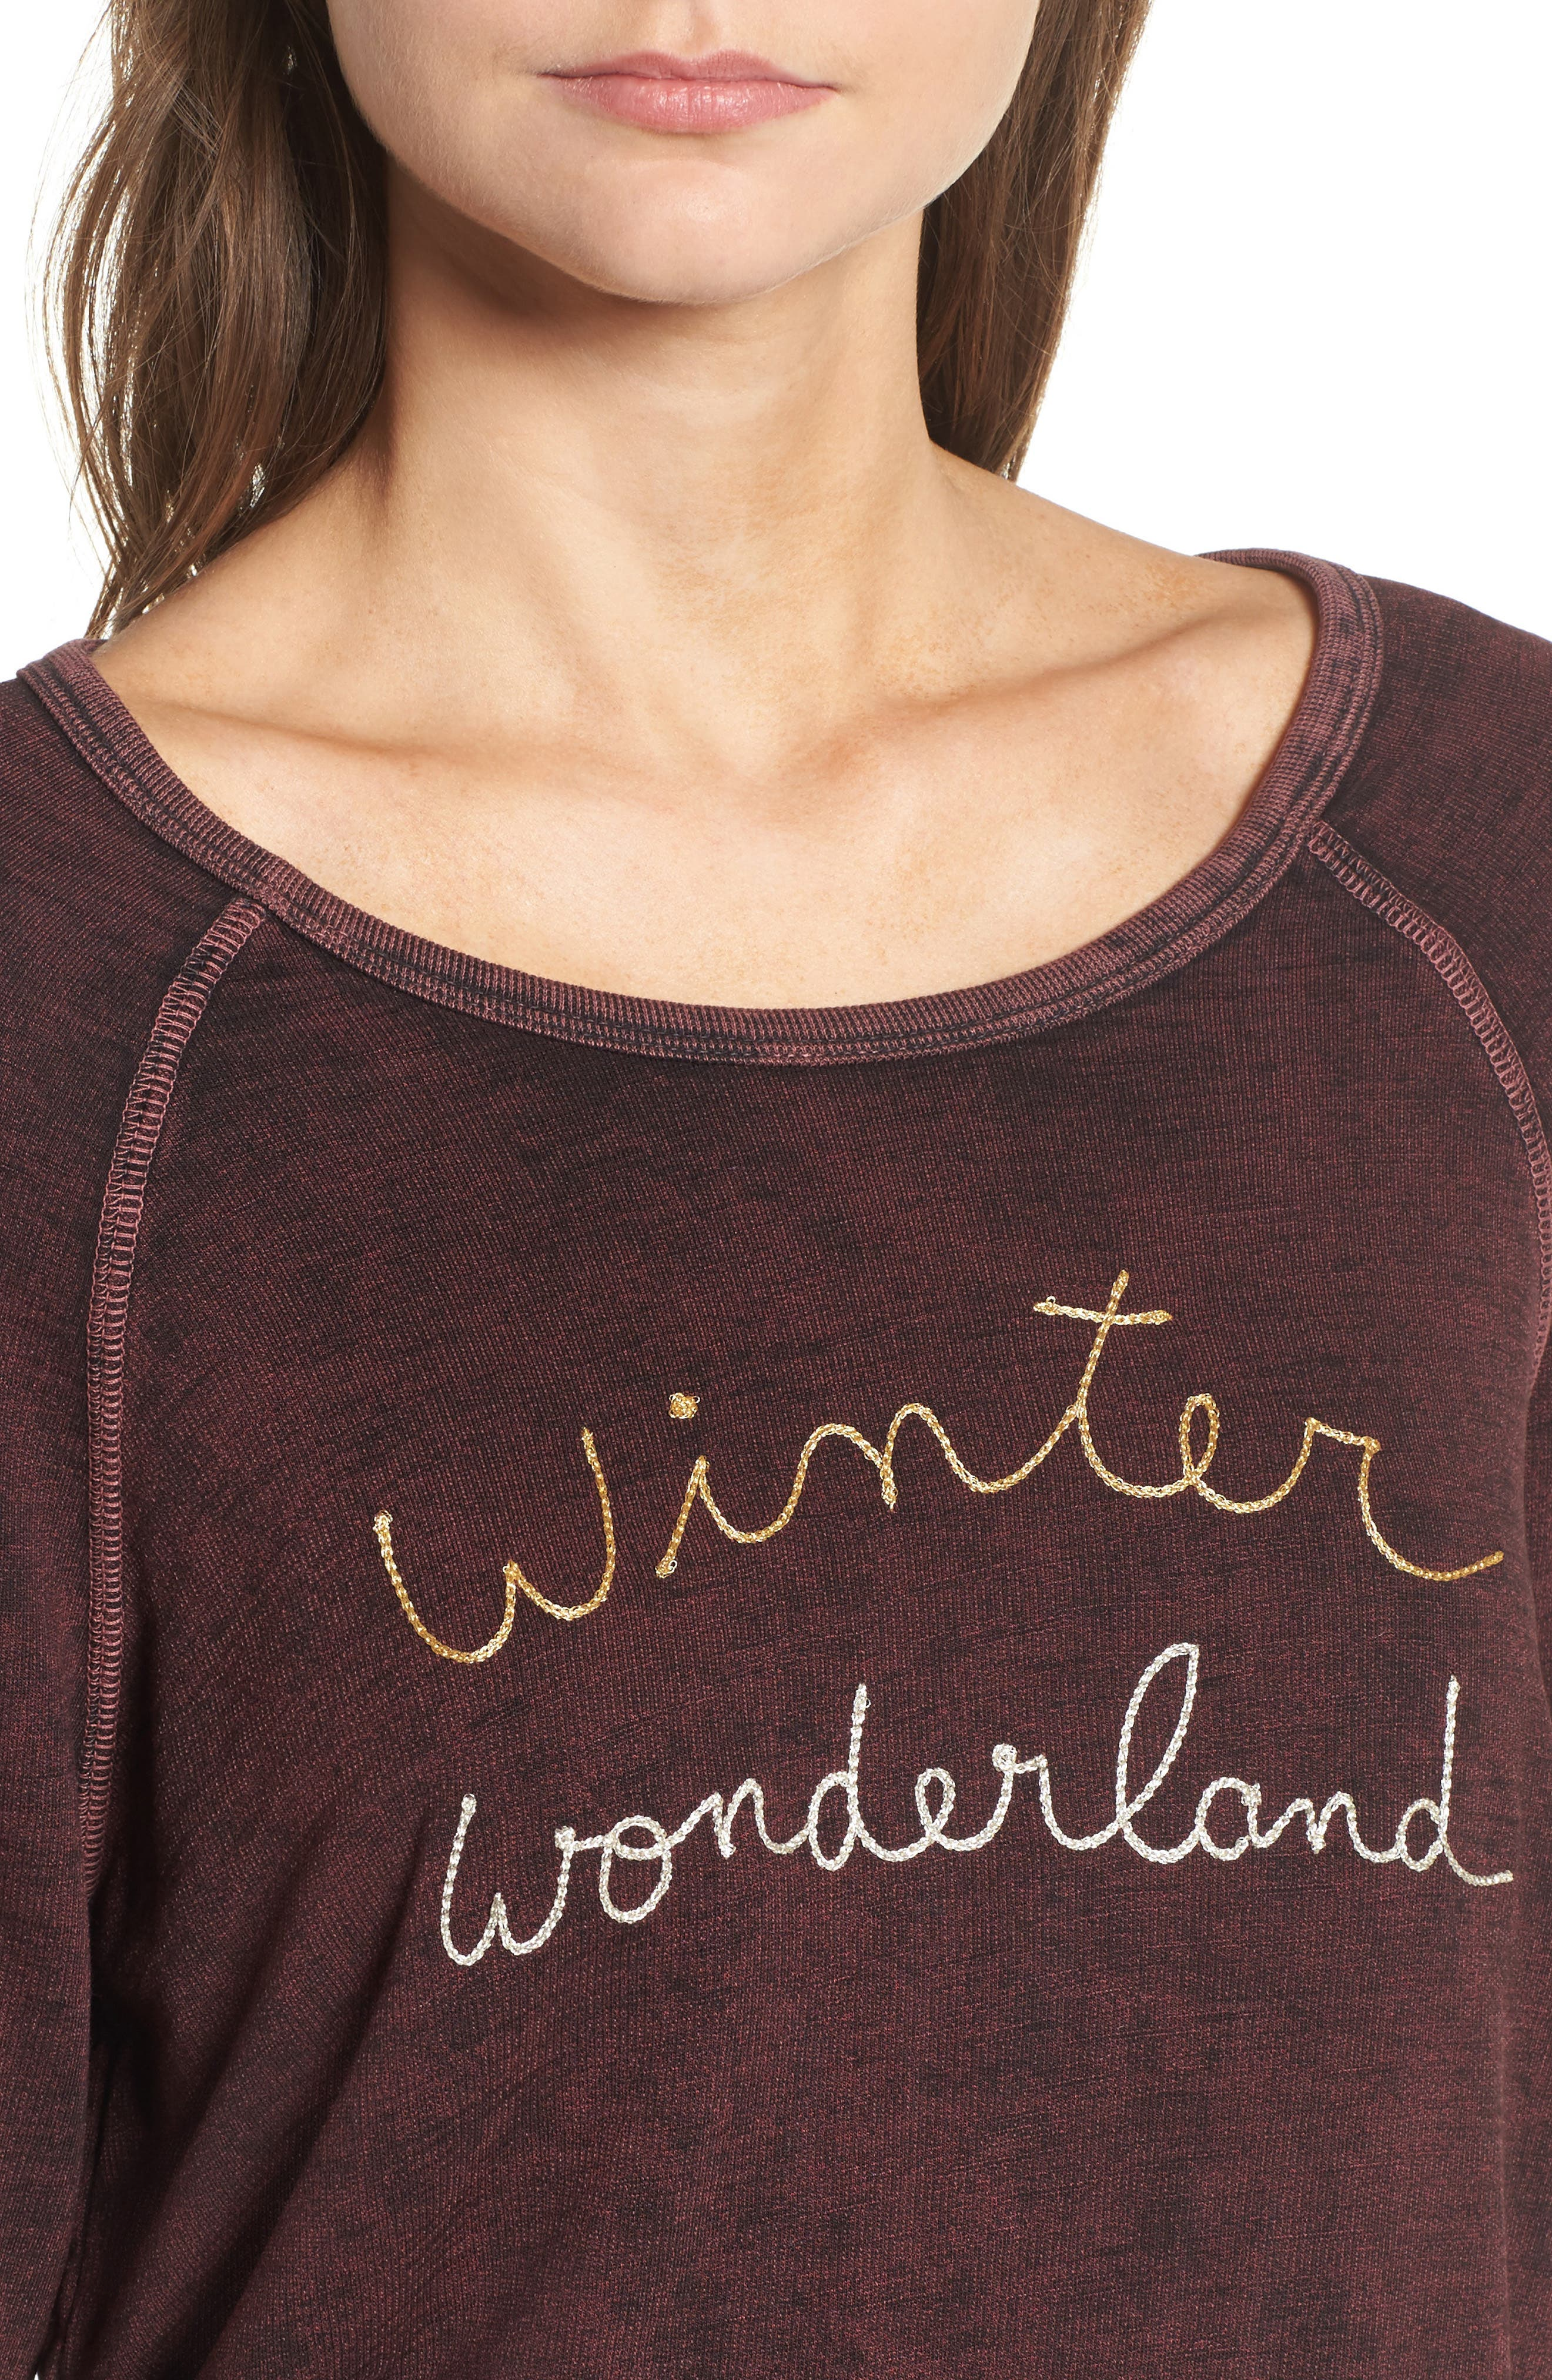 Active Winter Wonderland Sweatshirt,                             Alternate thumbnail 4, color,                             Burgundy Acid Wash